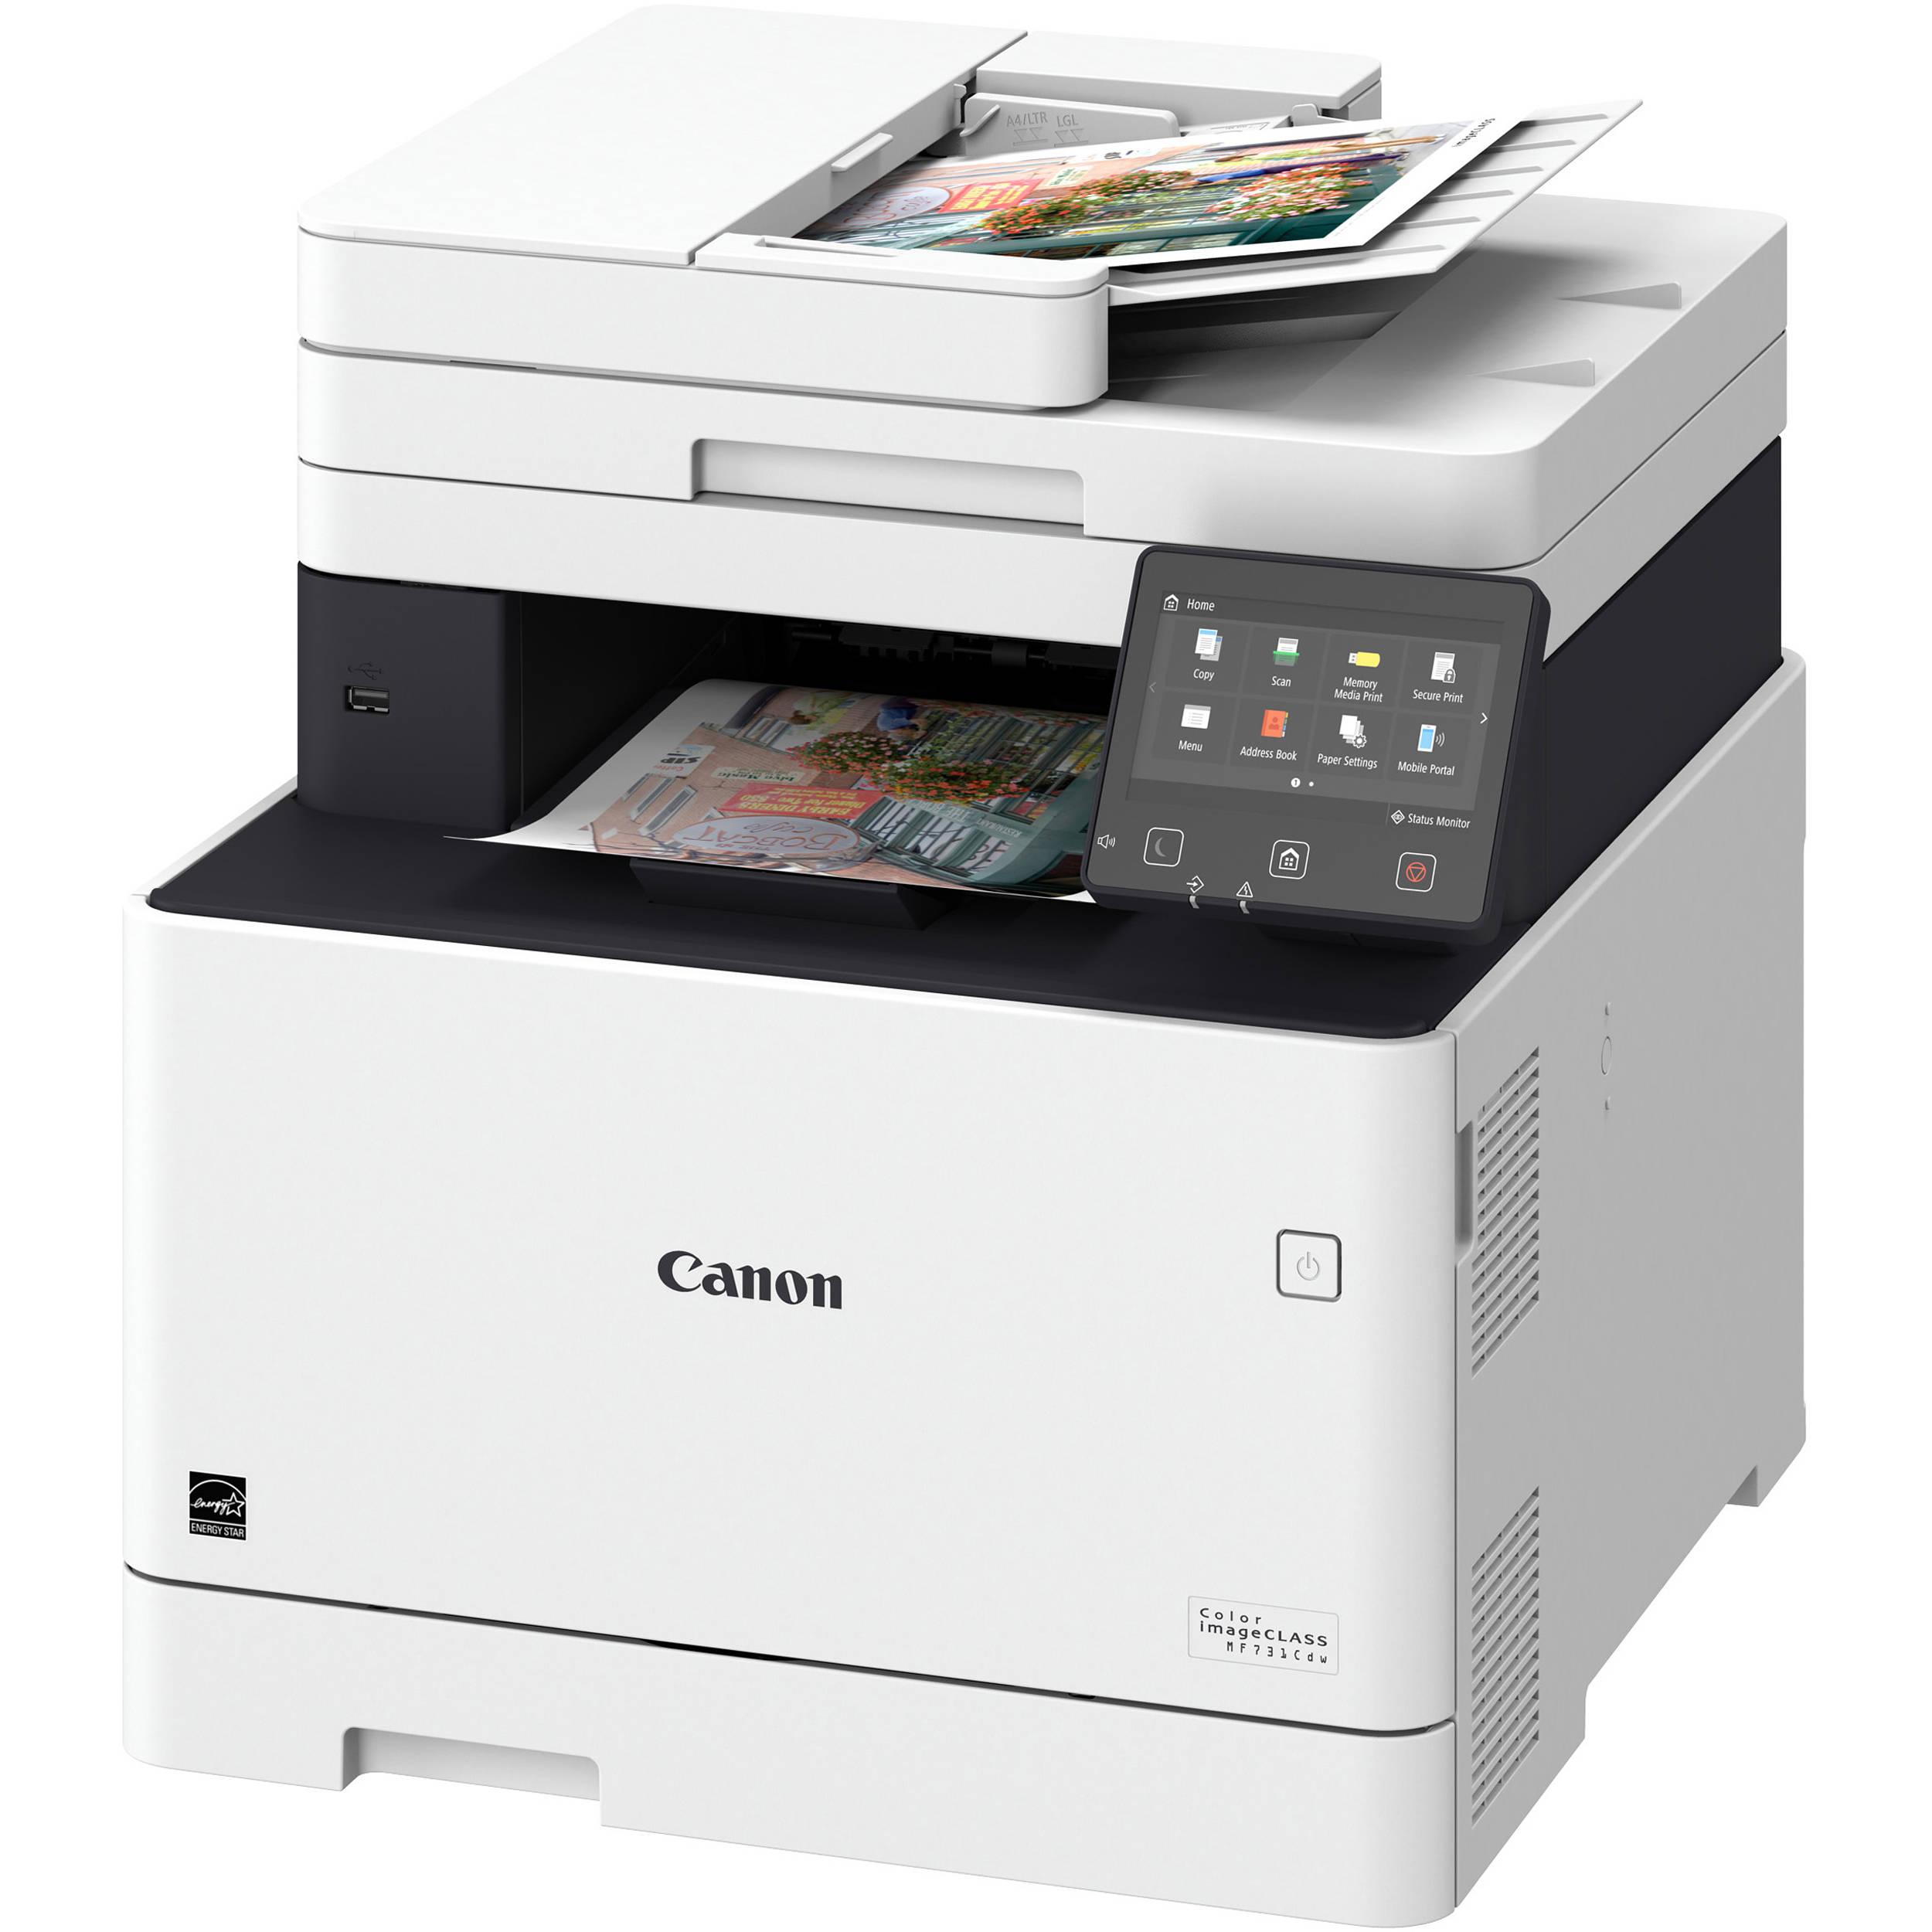 Canon imageCLASS MF731Cdw All-in-One Color Laser Printer